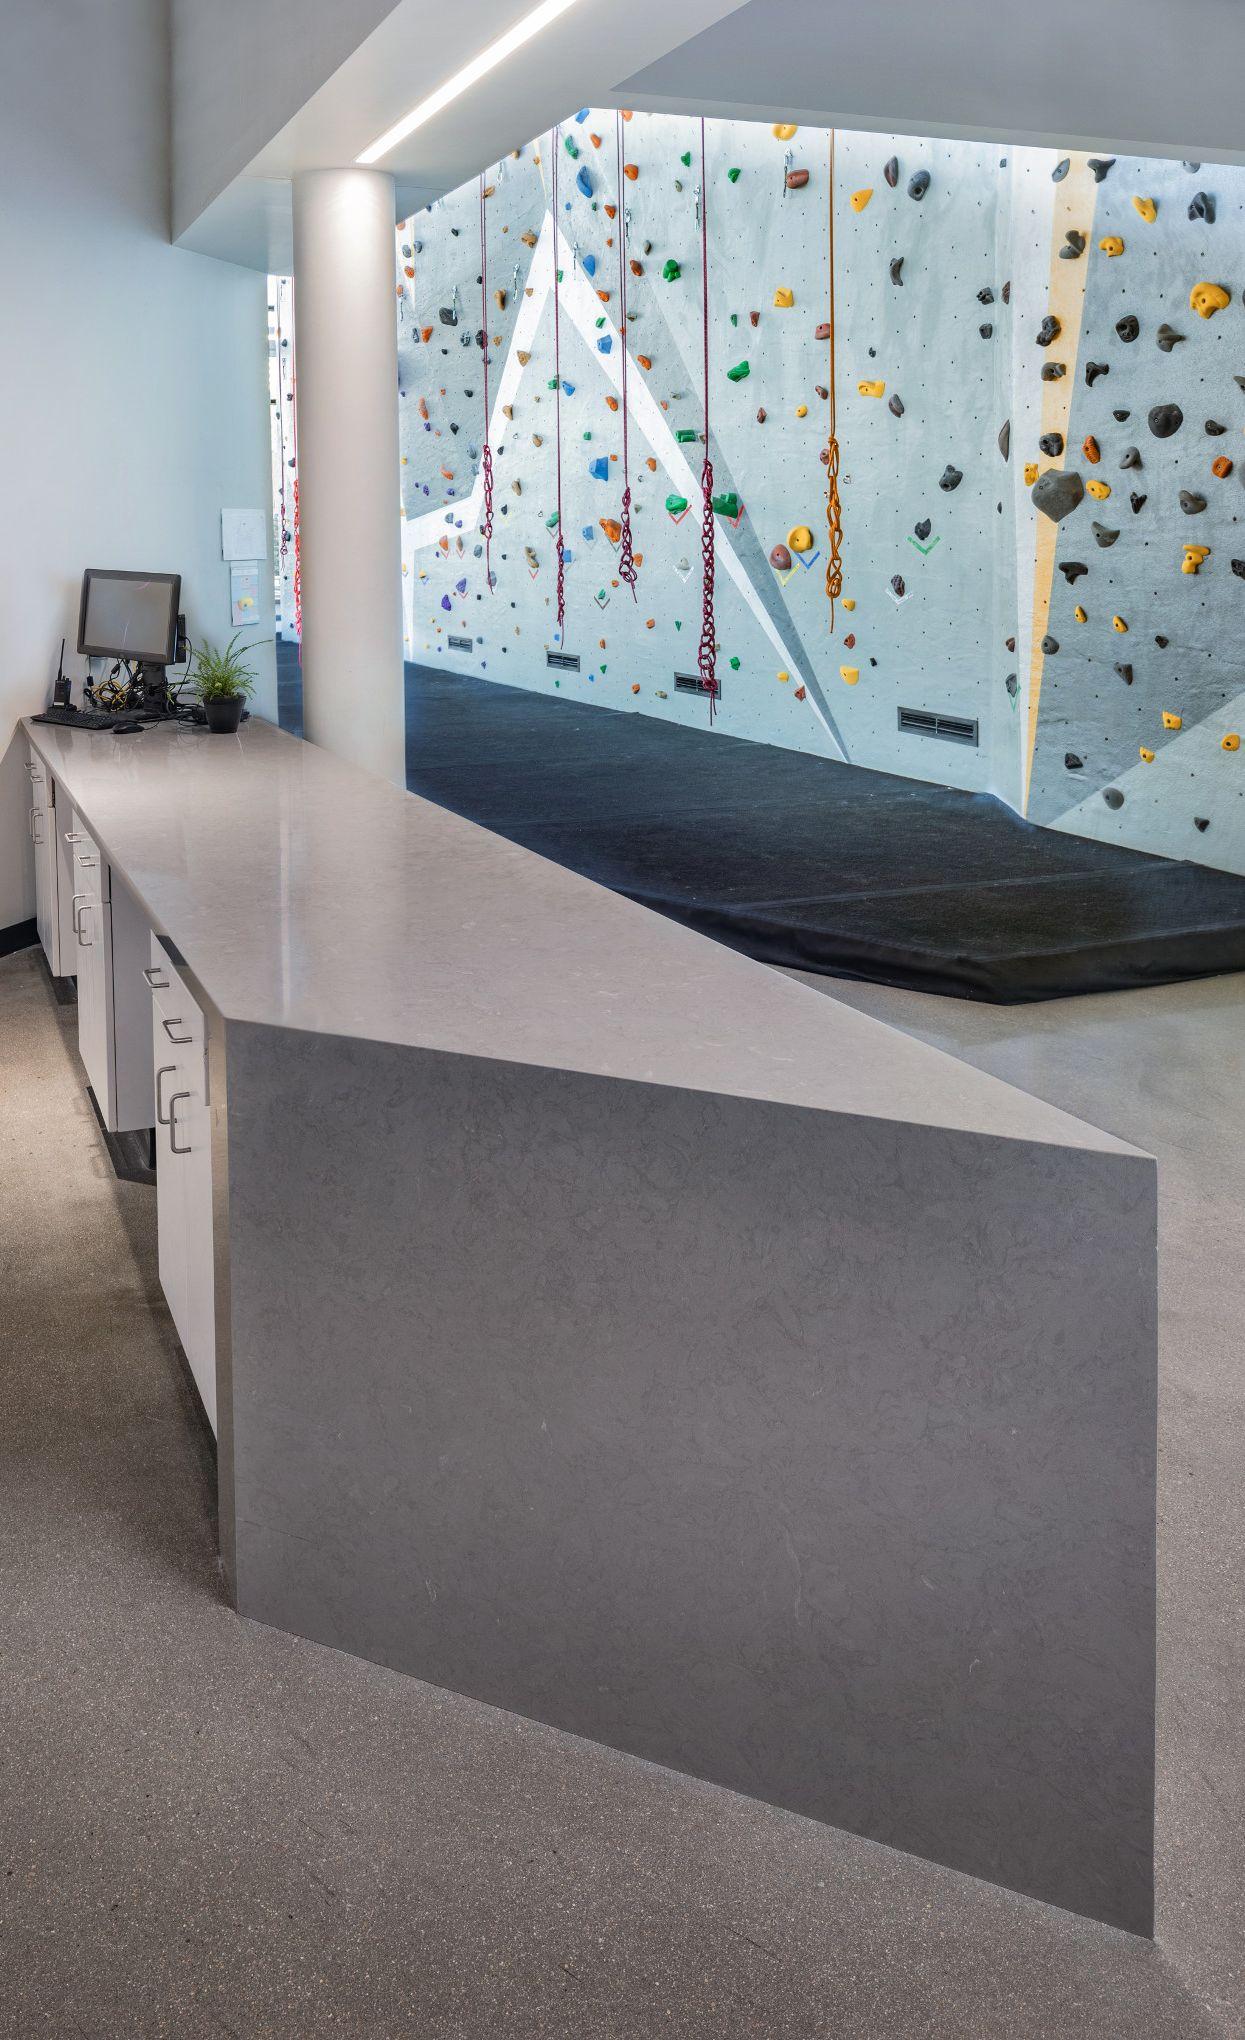 Concrete alternative reception desk in a wellness center featuring Cambria Carrick.